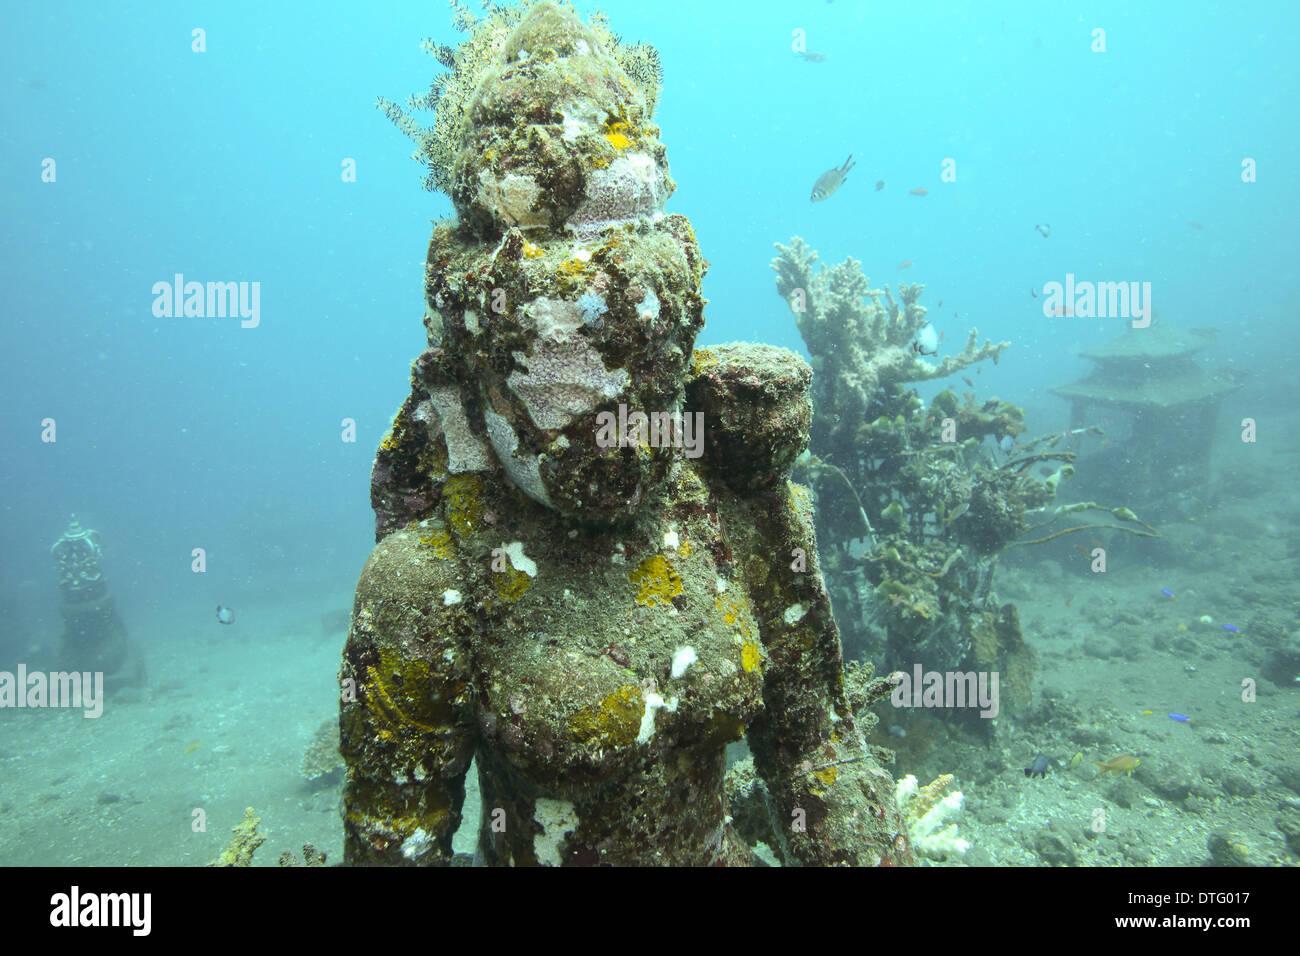 Hindu deity stone statue on ocean floor in Amed, east Bali - Stock Image